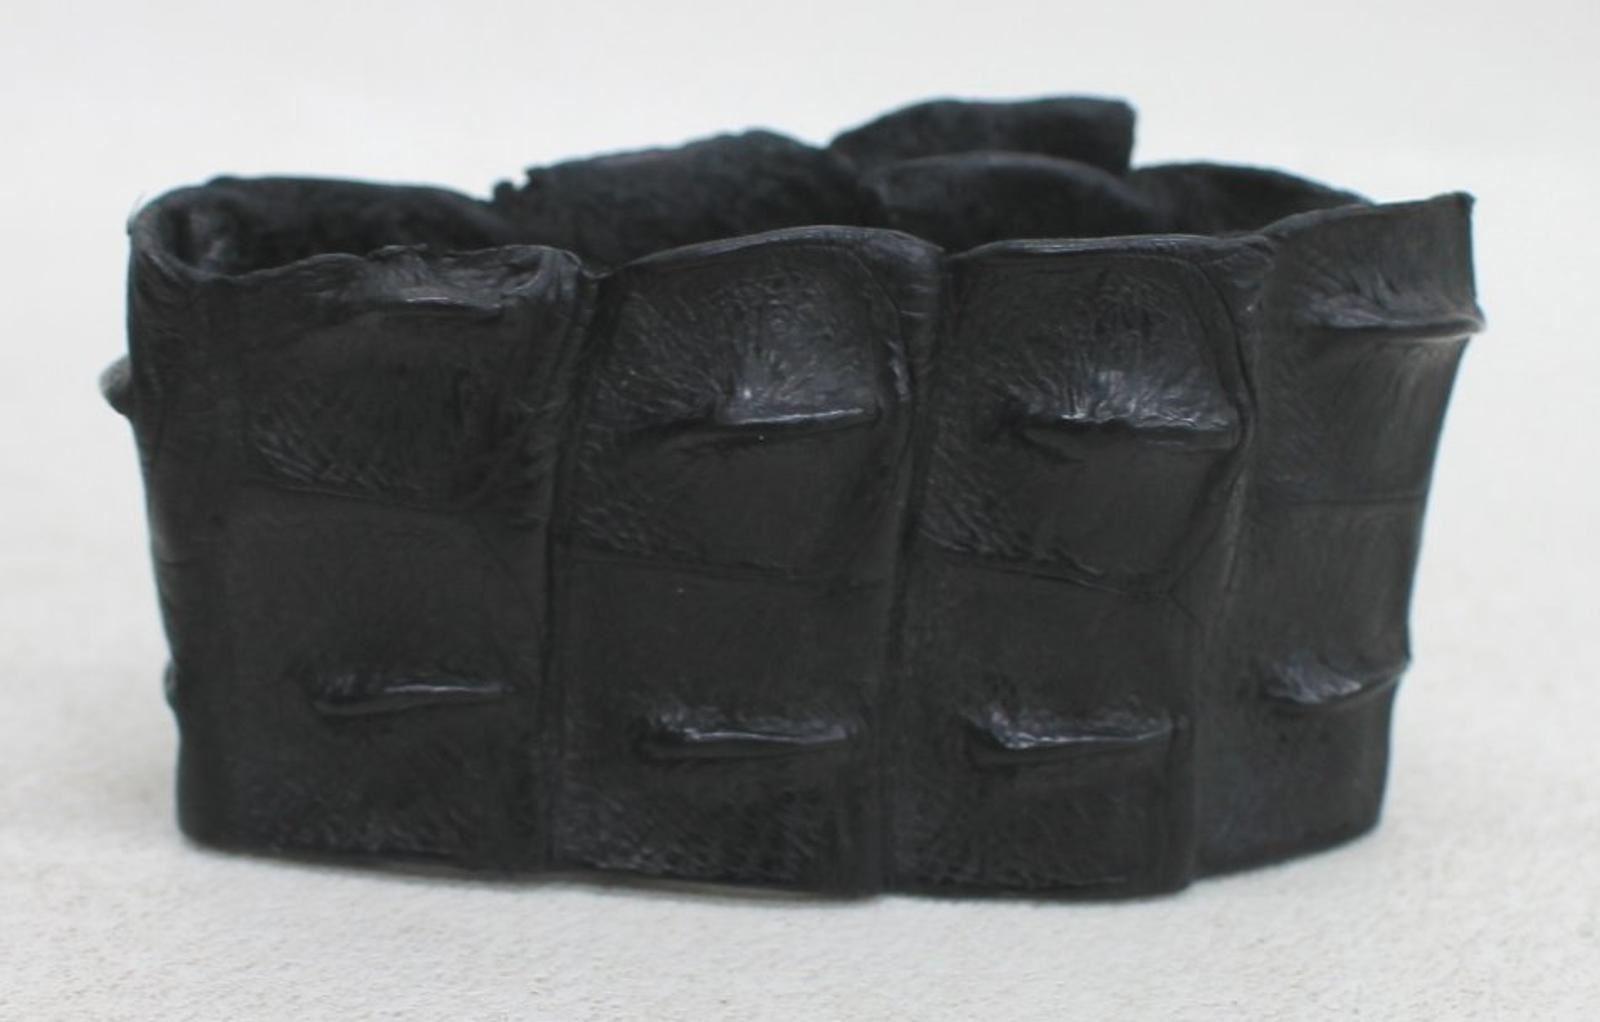 Ladies-Black-Alligator-Leather-40mm-Width-Single-Stud-Fasten-Bracelet-Wrist-Cuff